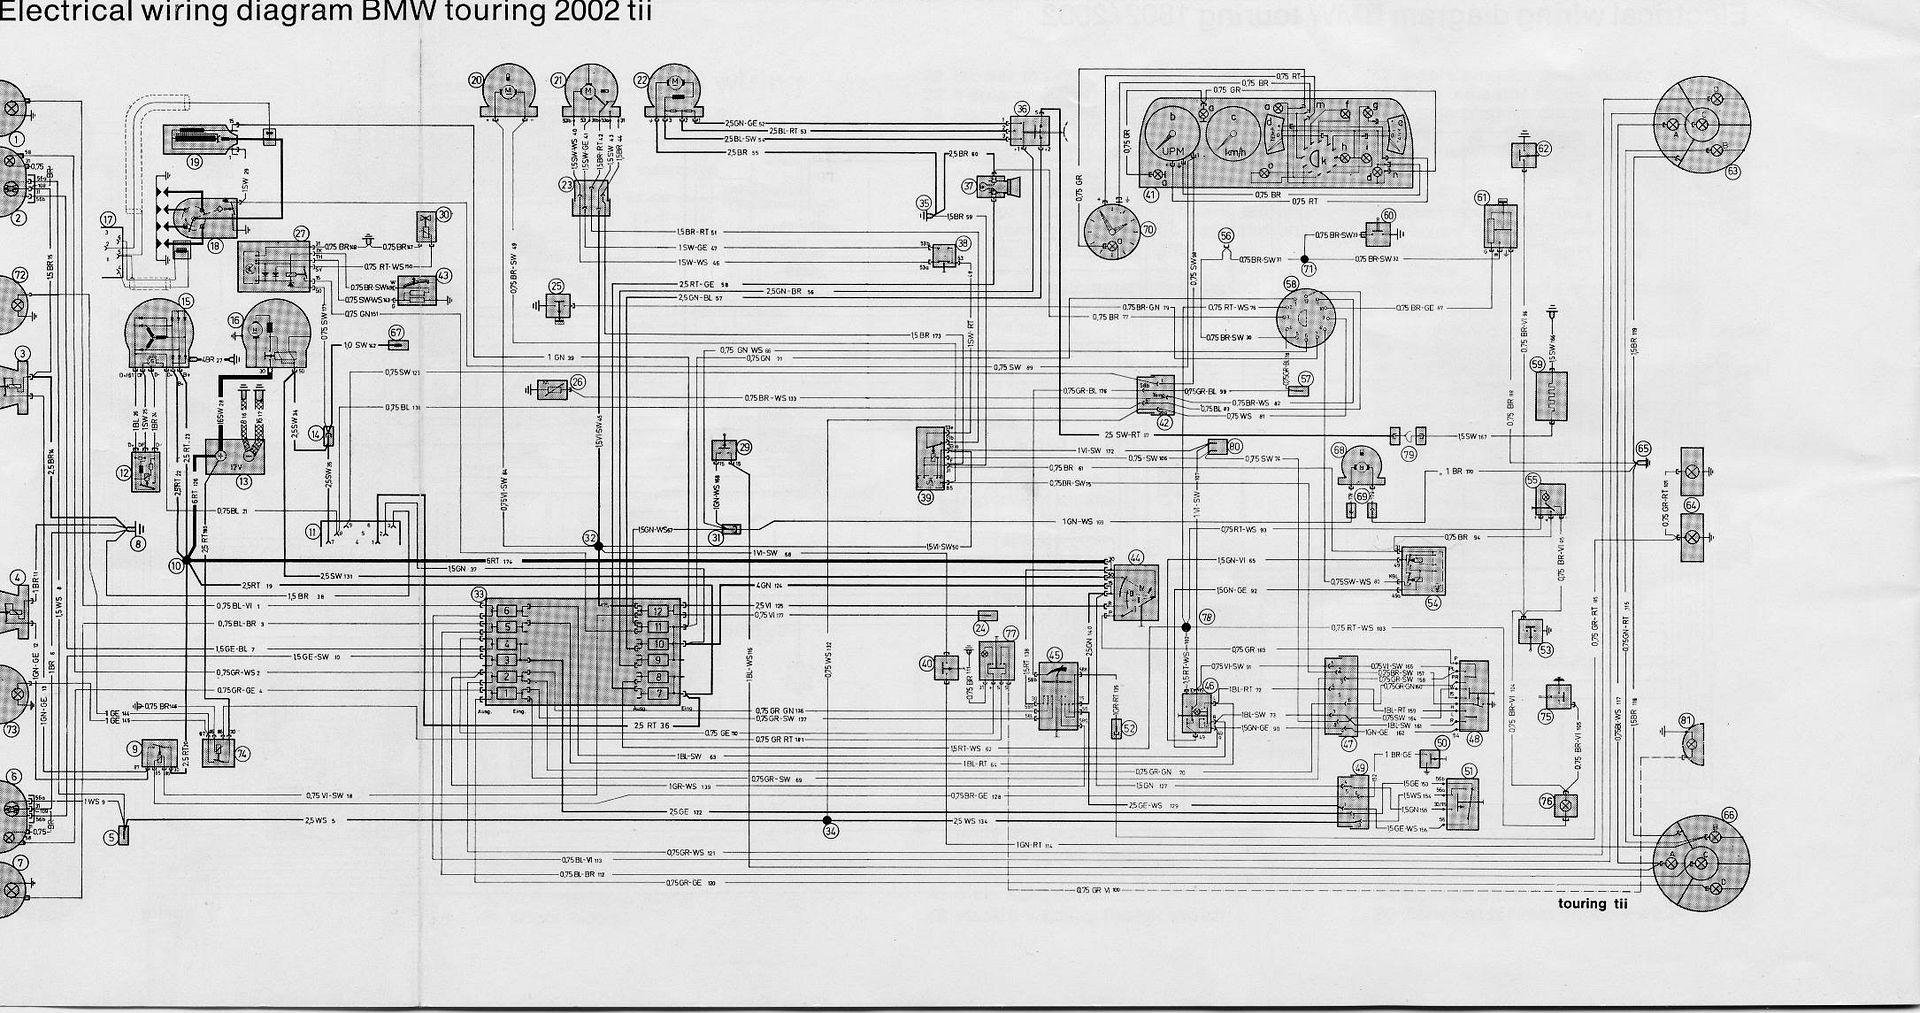 diagramme} bmw 330i wire diagram full version hd quality wire diagram -  electricmotorcycle4sale.webgif.it  webgif.it